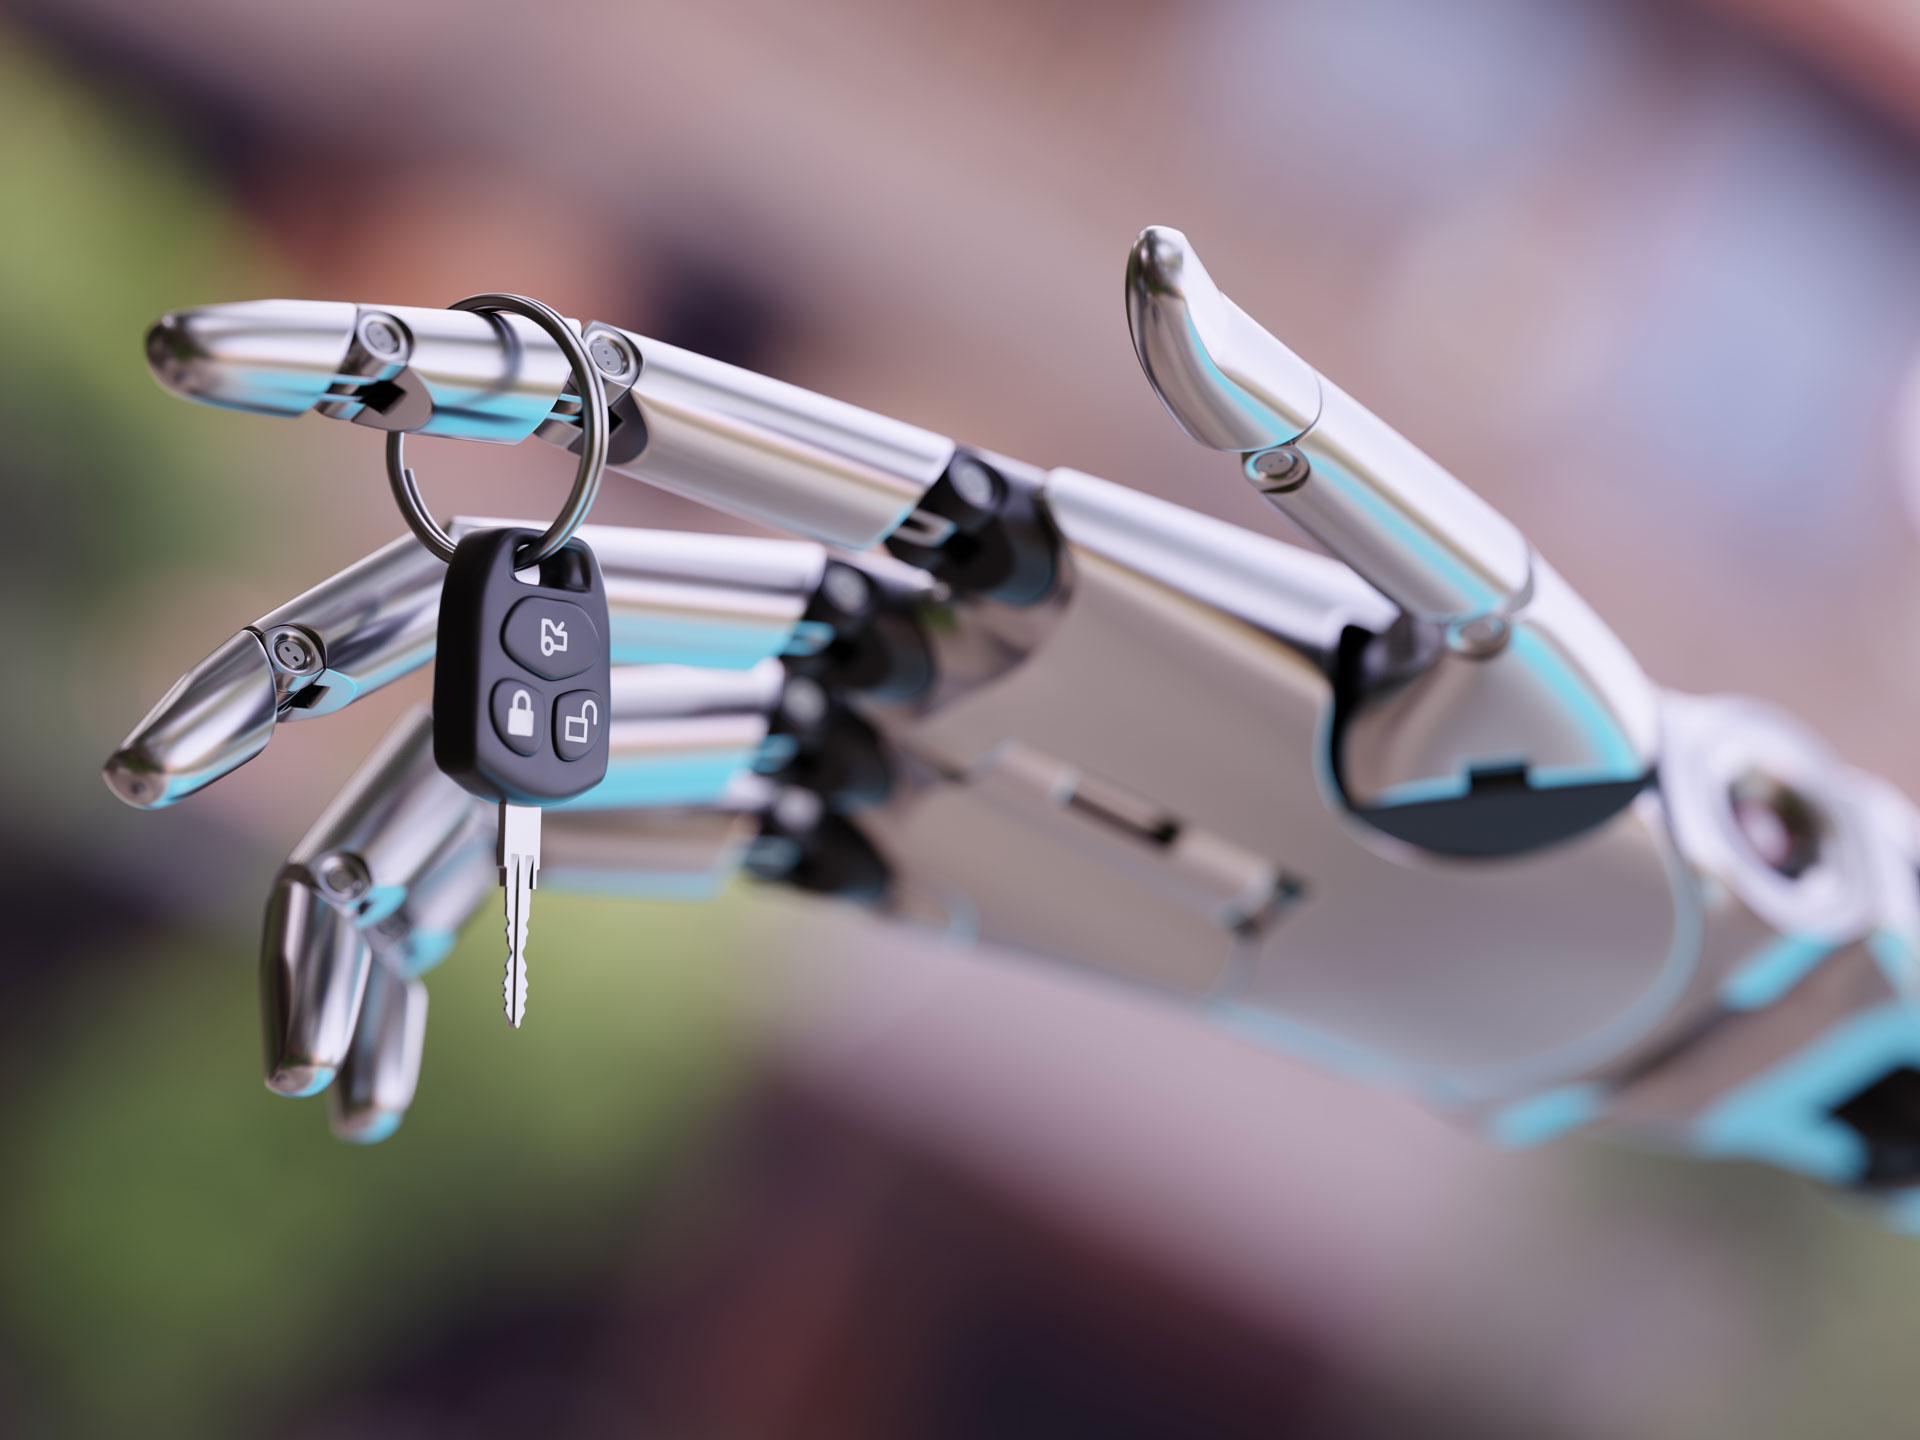 robot hand with car keys